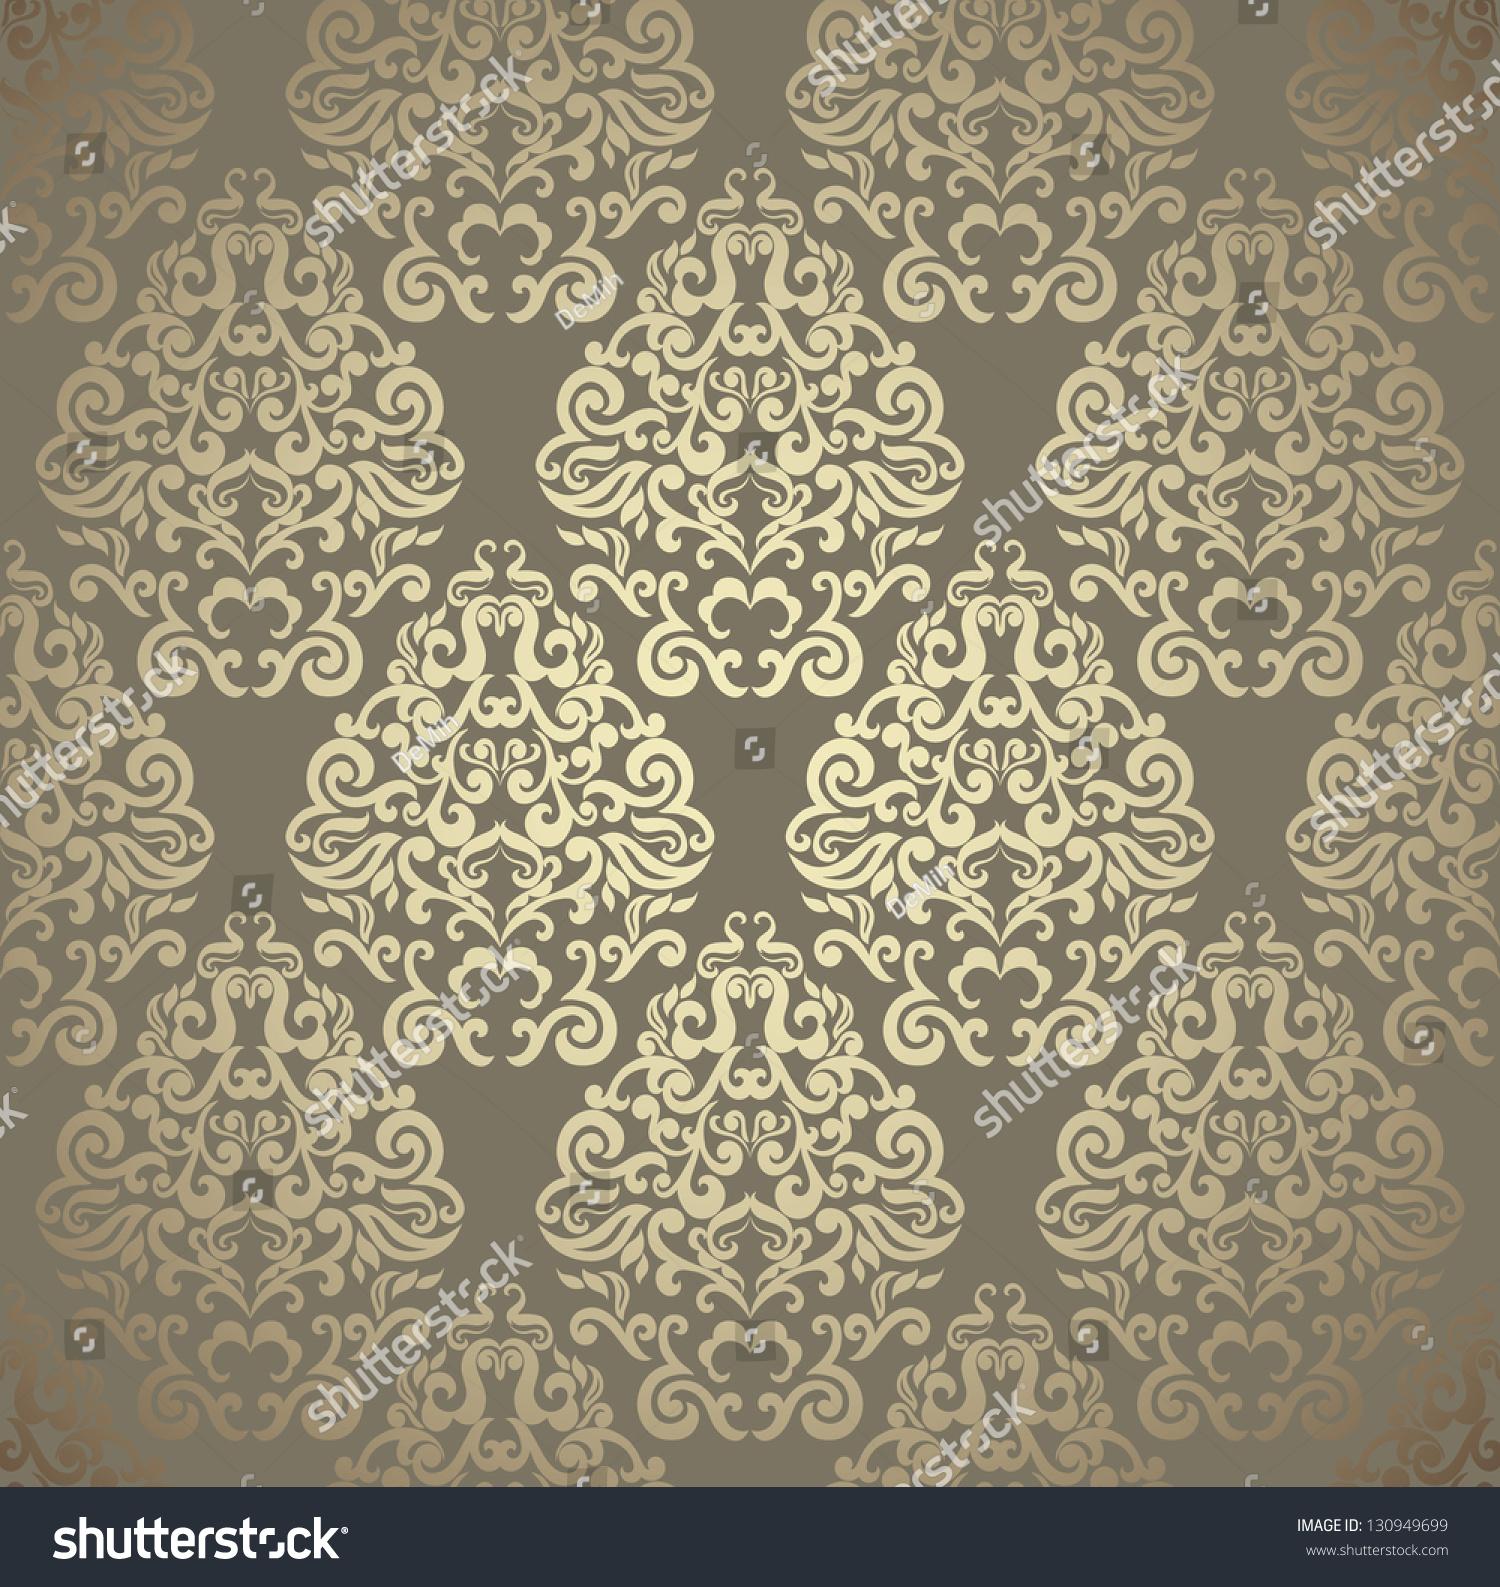 damask wallpaper glamorous and elegant - photo #3